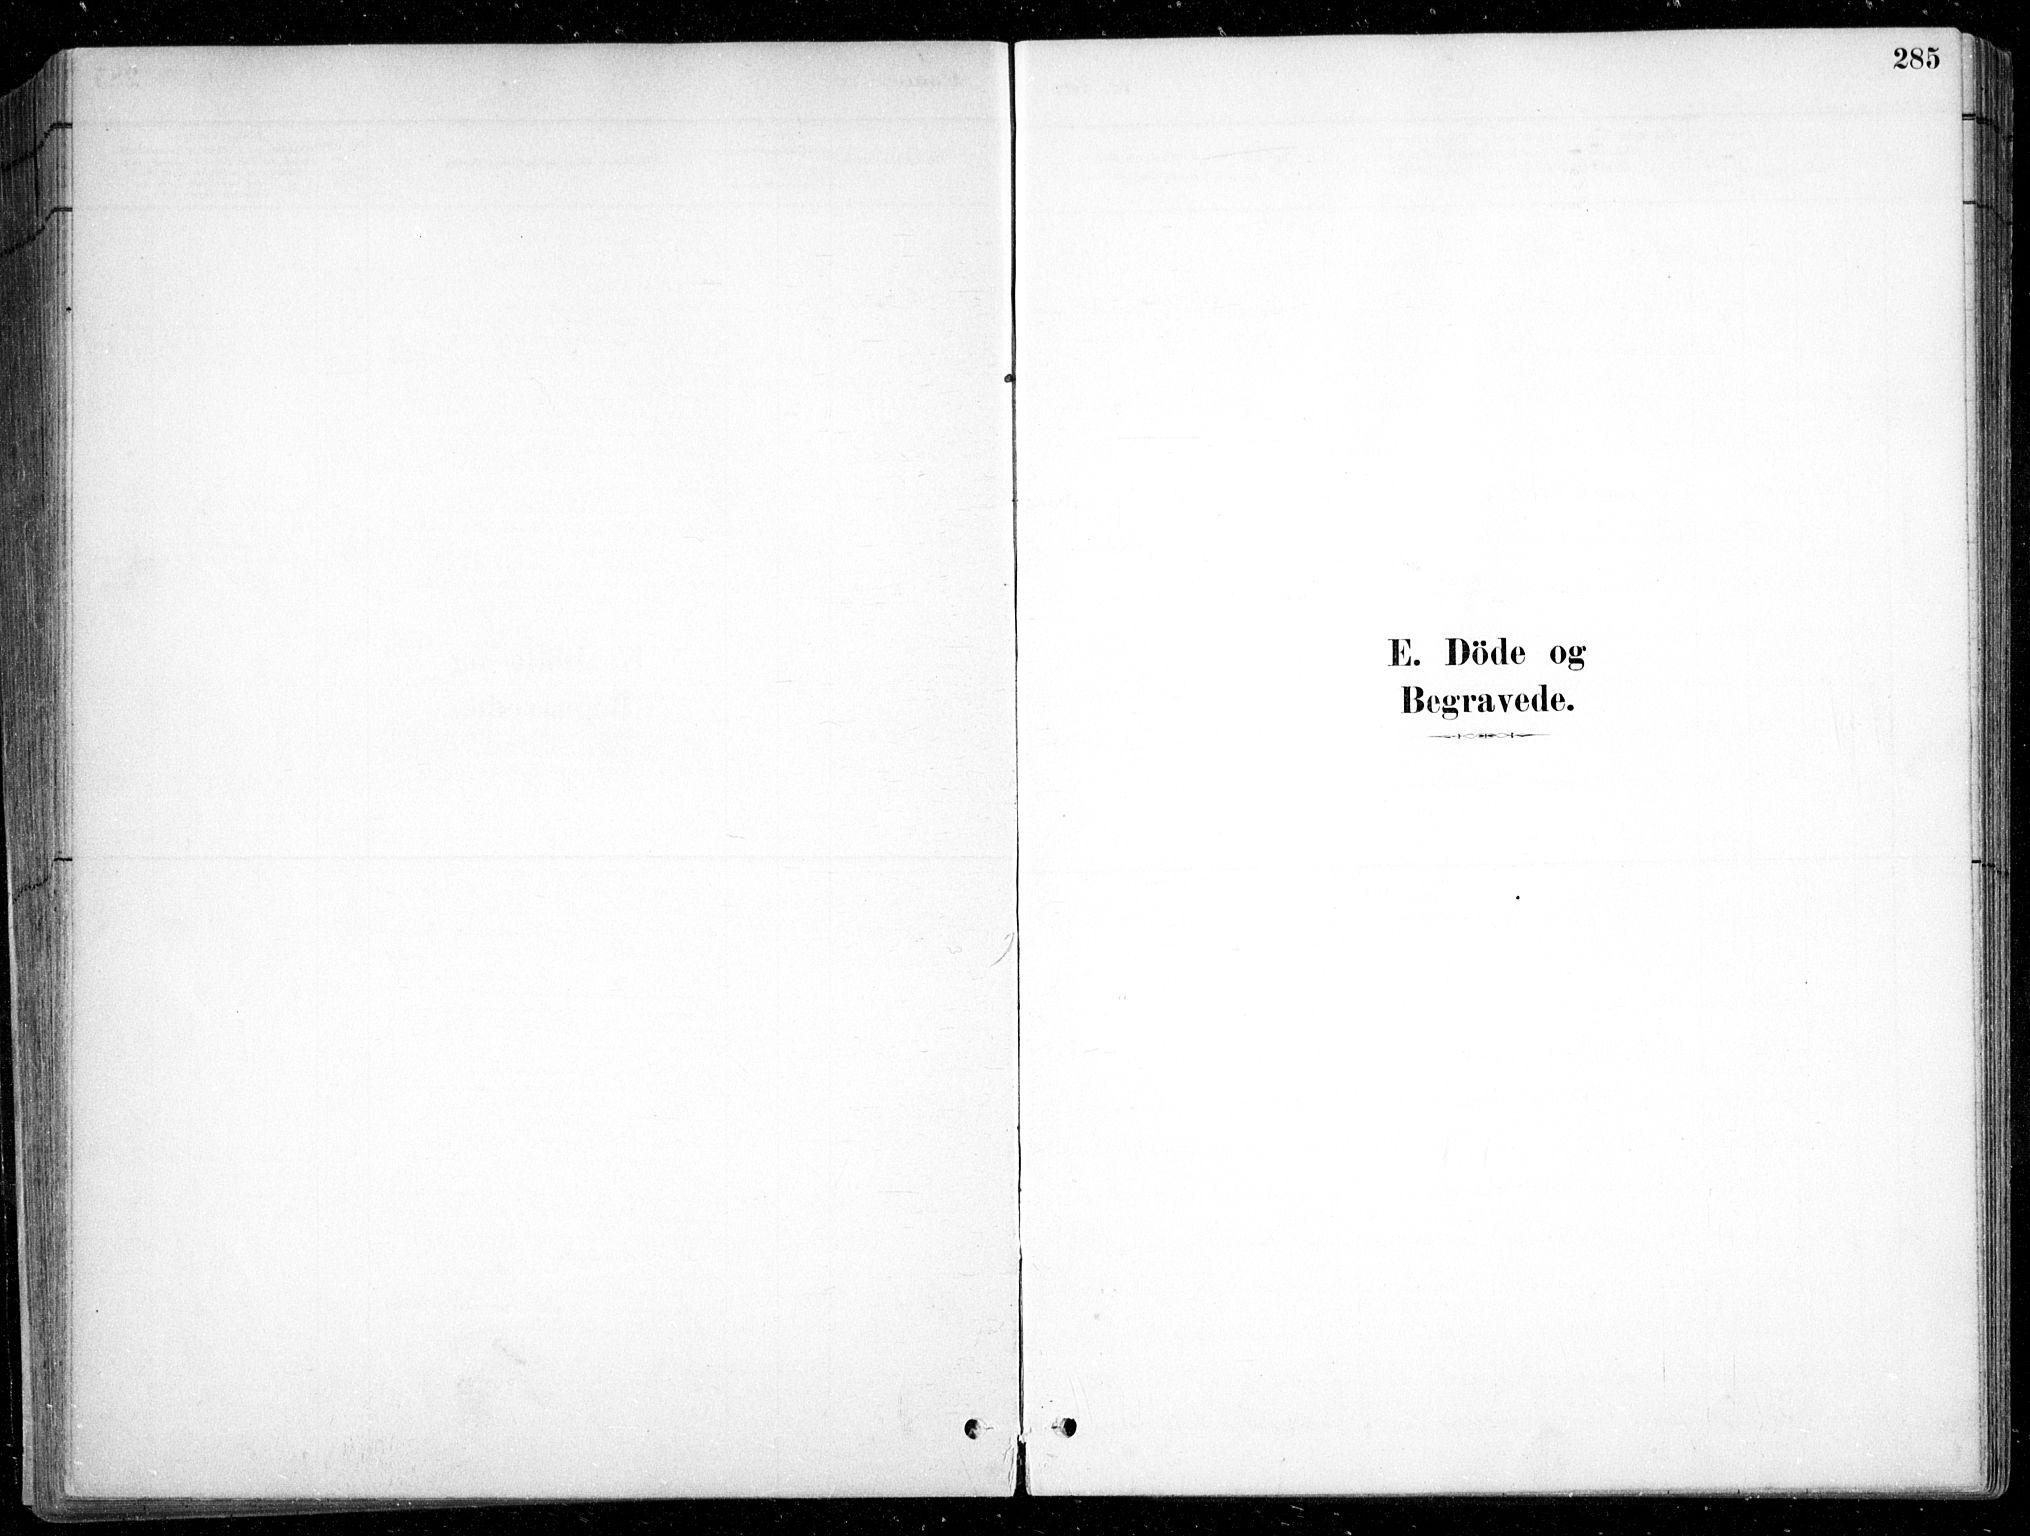 SAK, Fjære sokneprestkontor, F/Fb/L0011: Klokkerbok nr. B 11, 1881-1905, s. 285